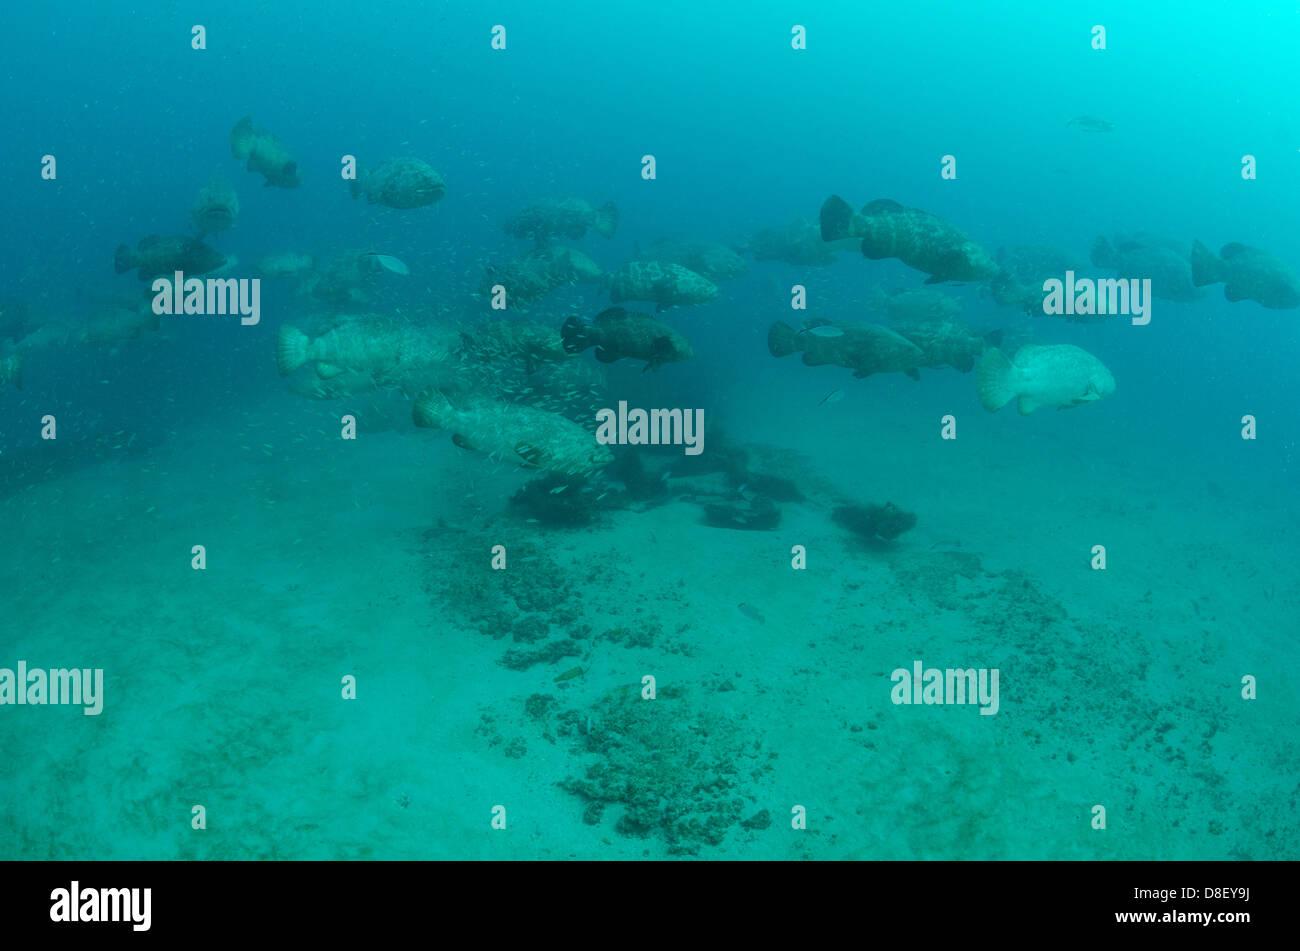 Goliath Grouper Aggregation near Palm Beach, Florida - Stock Image